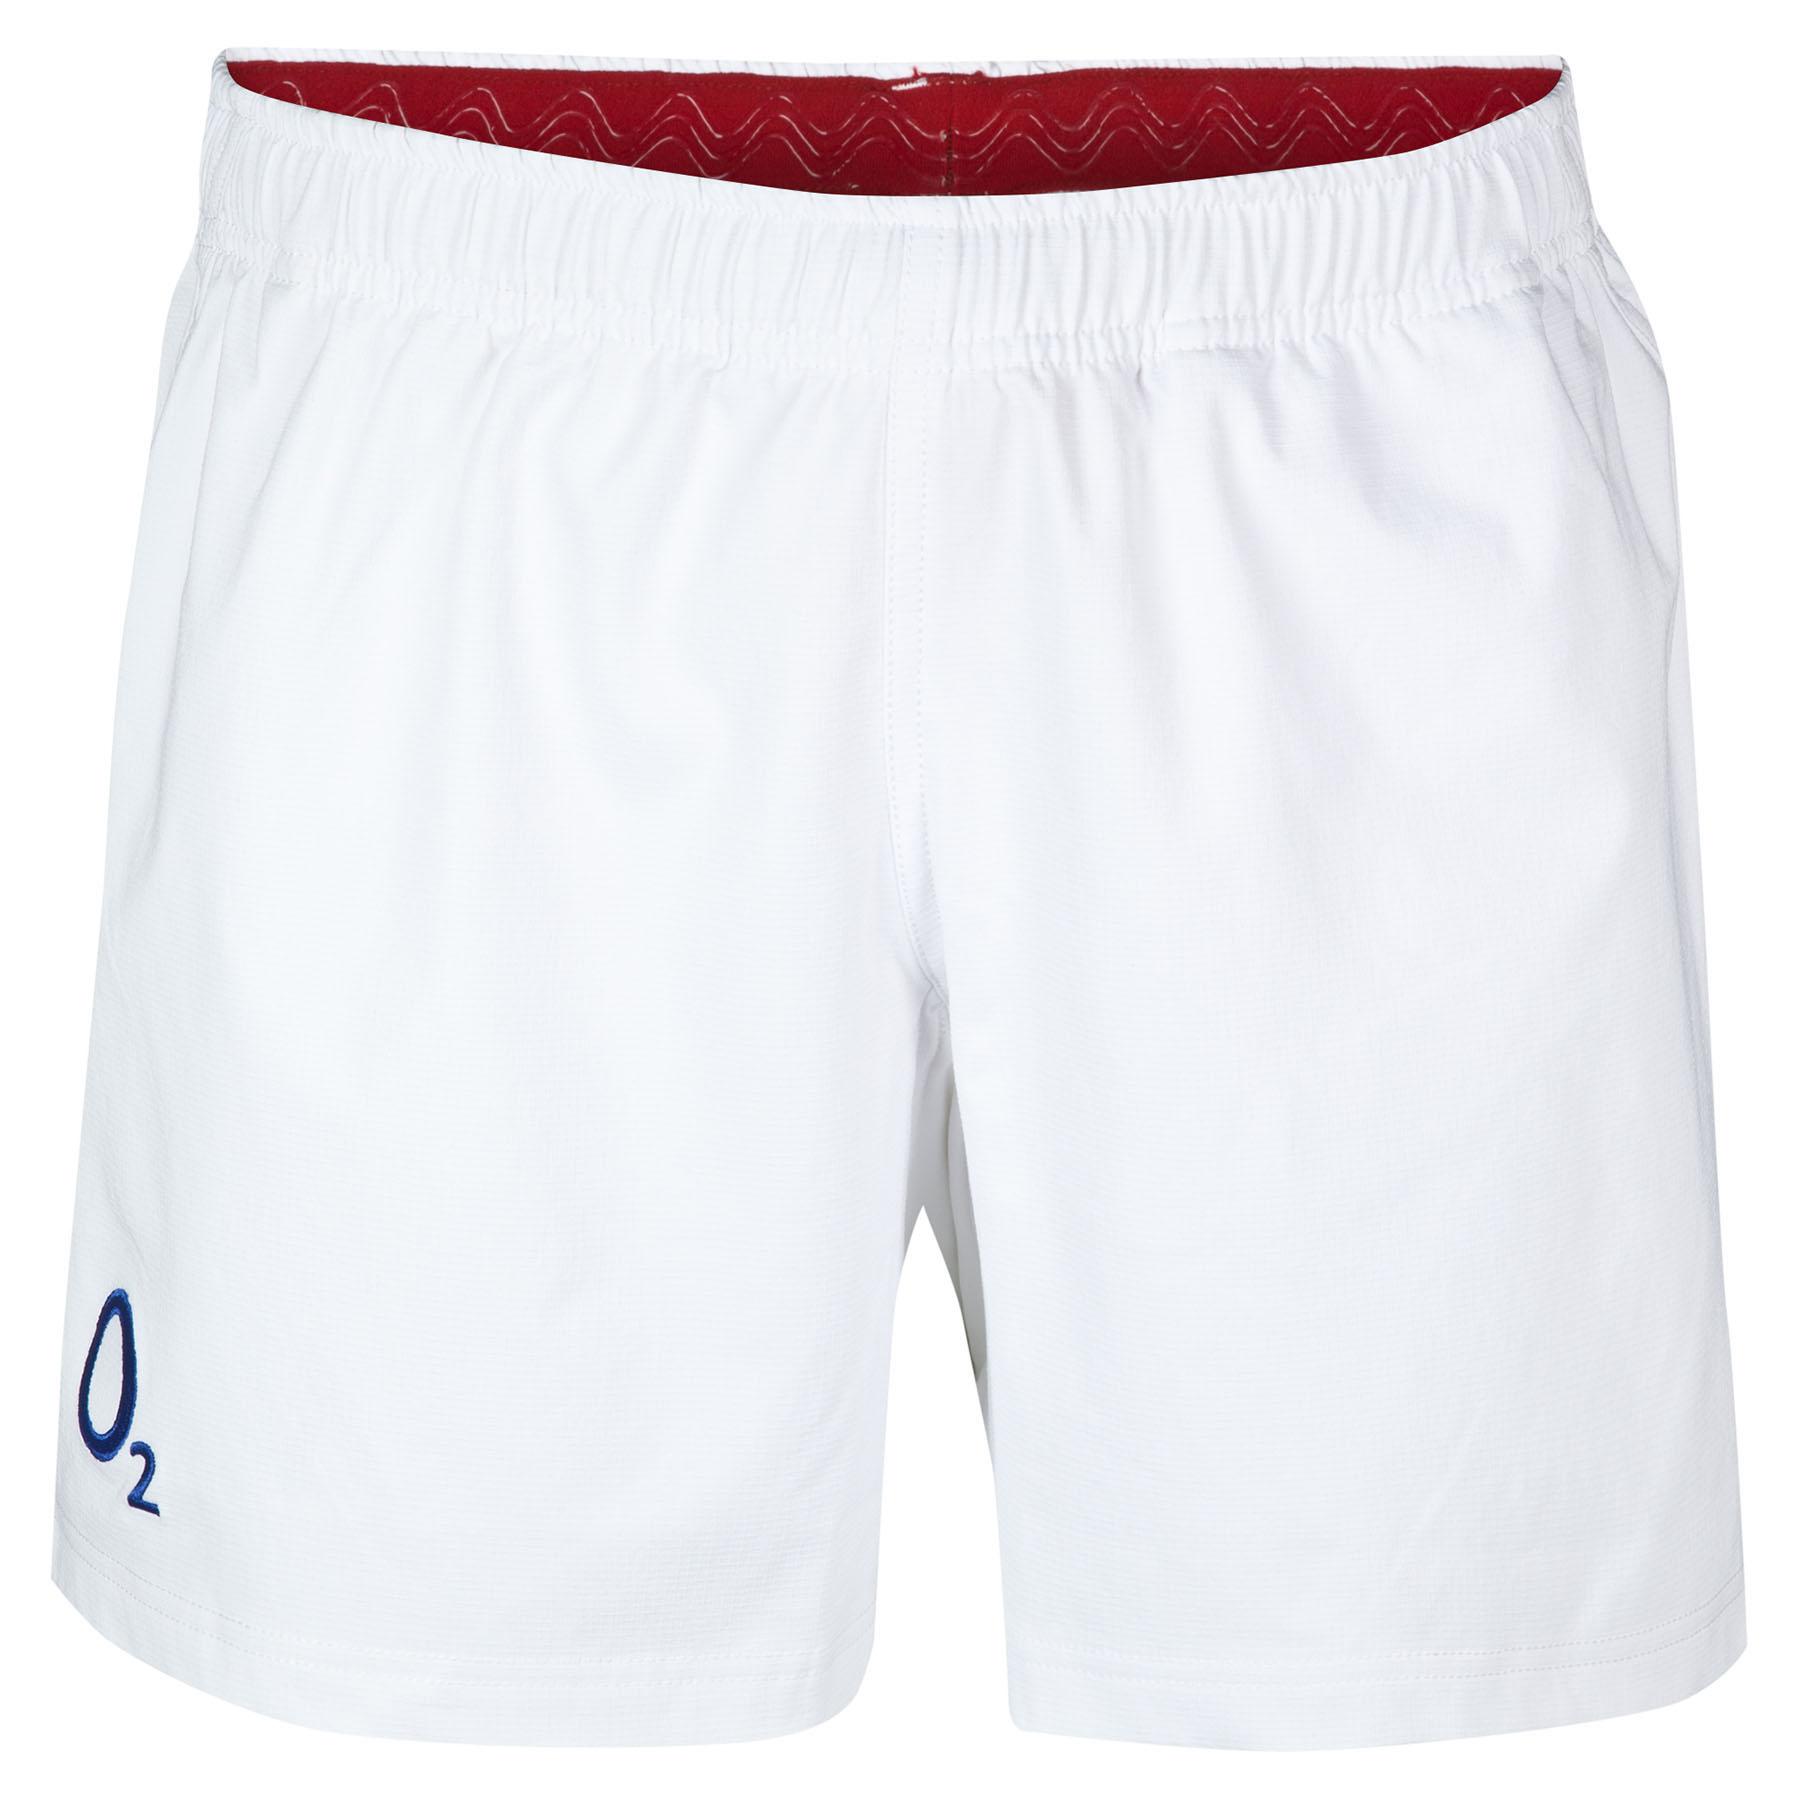 England Home Short 2014/15 - Kids Navy